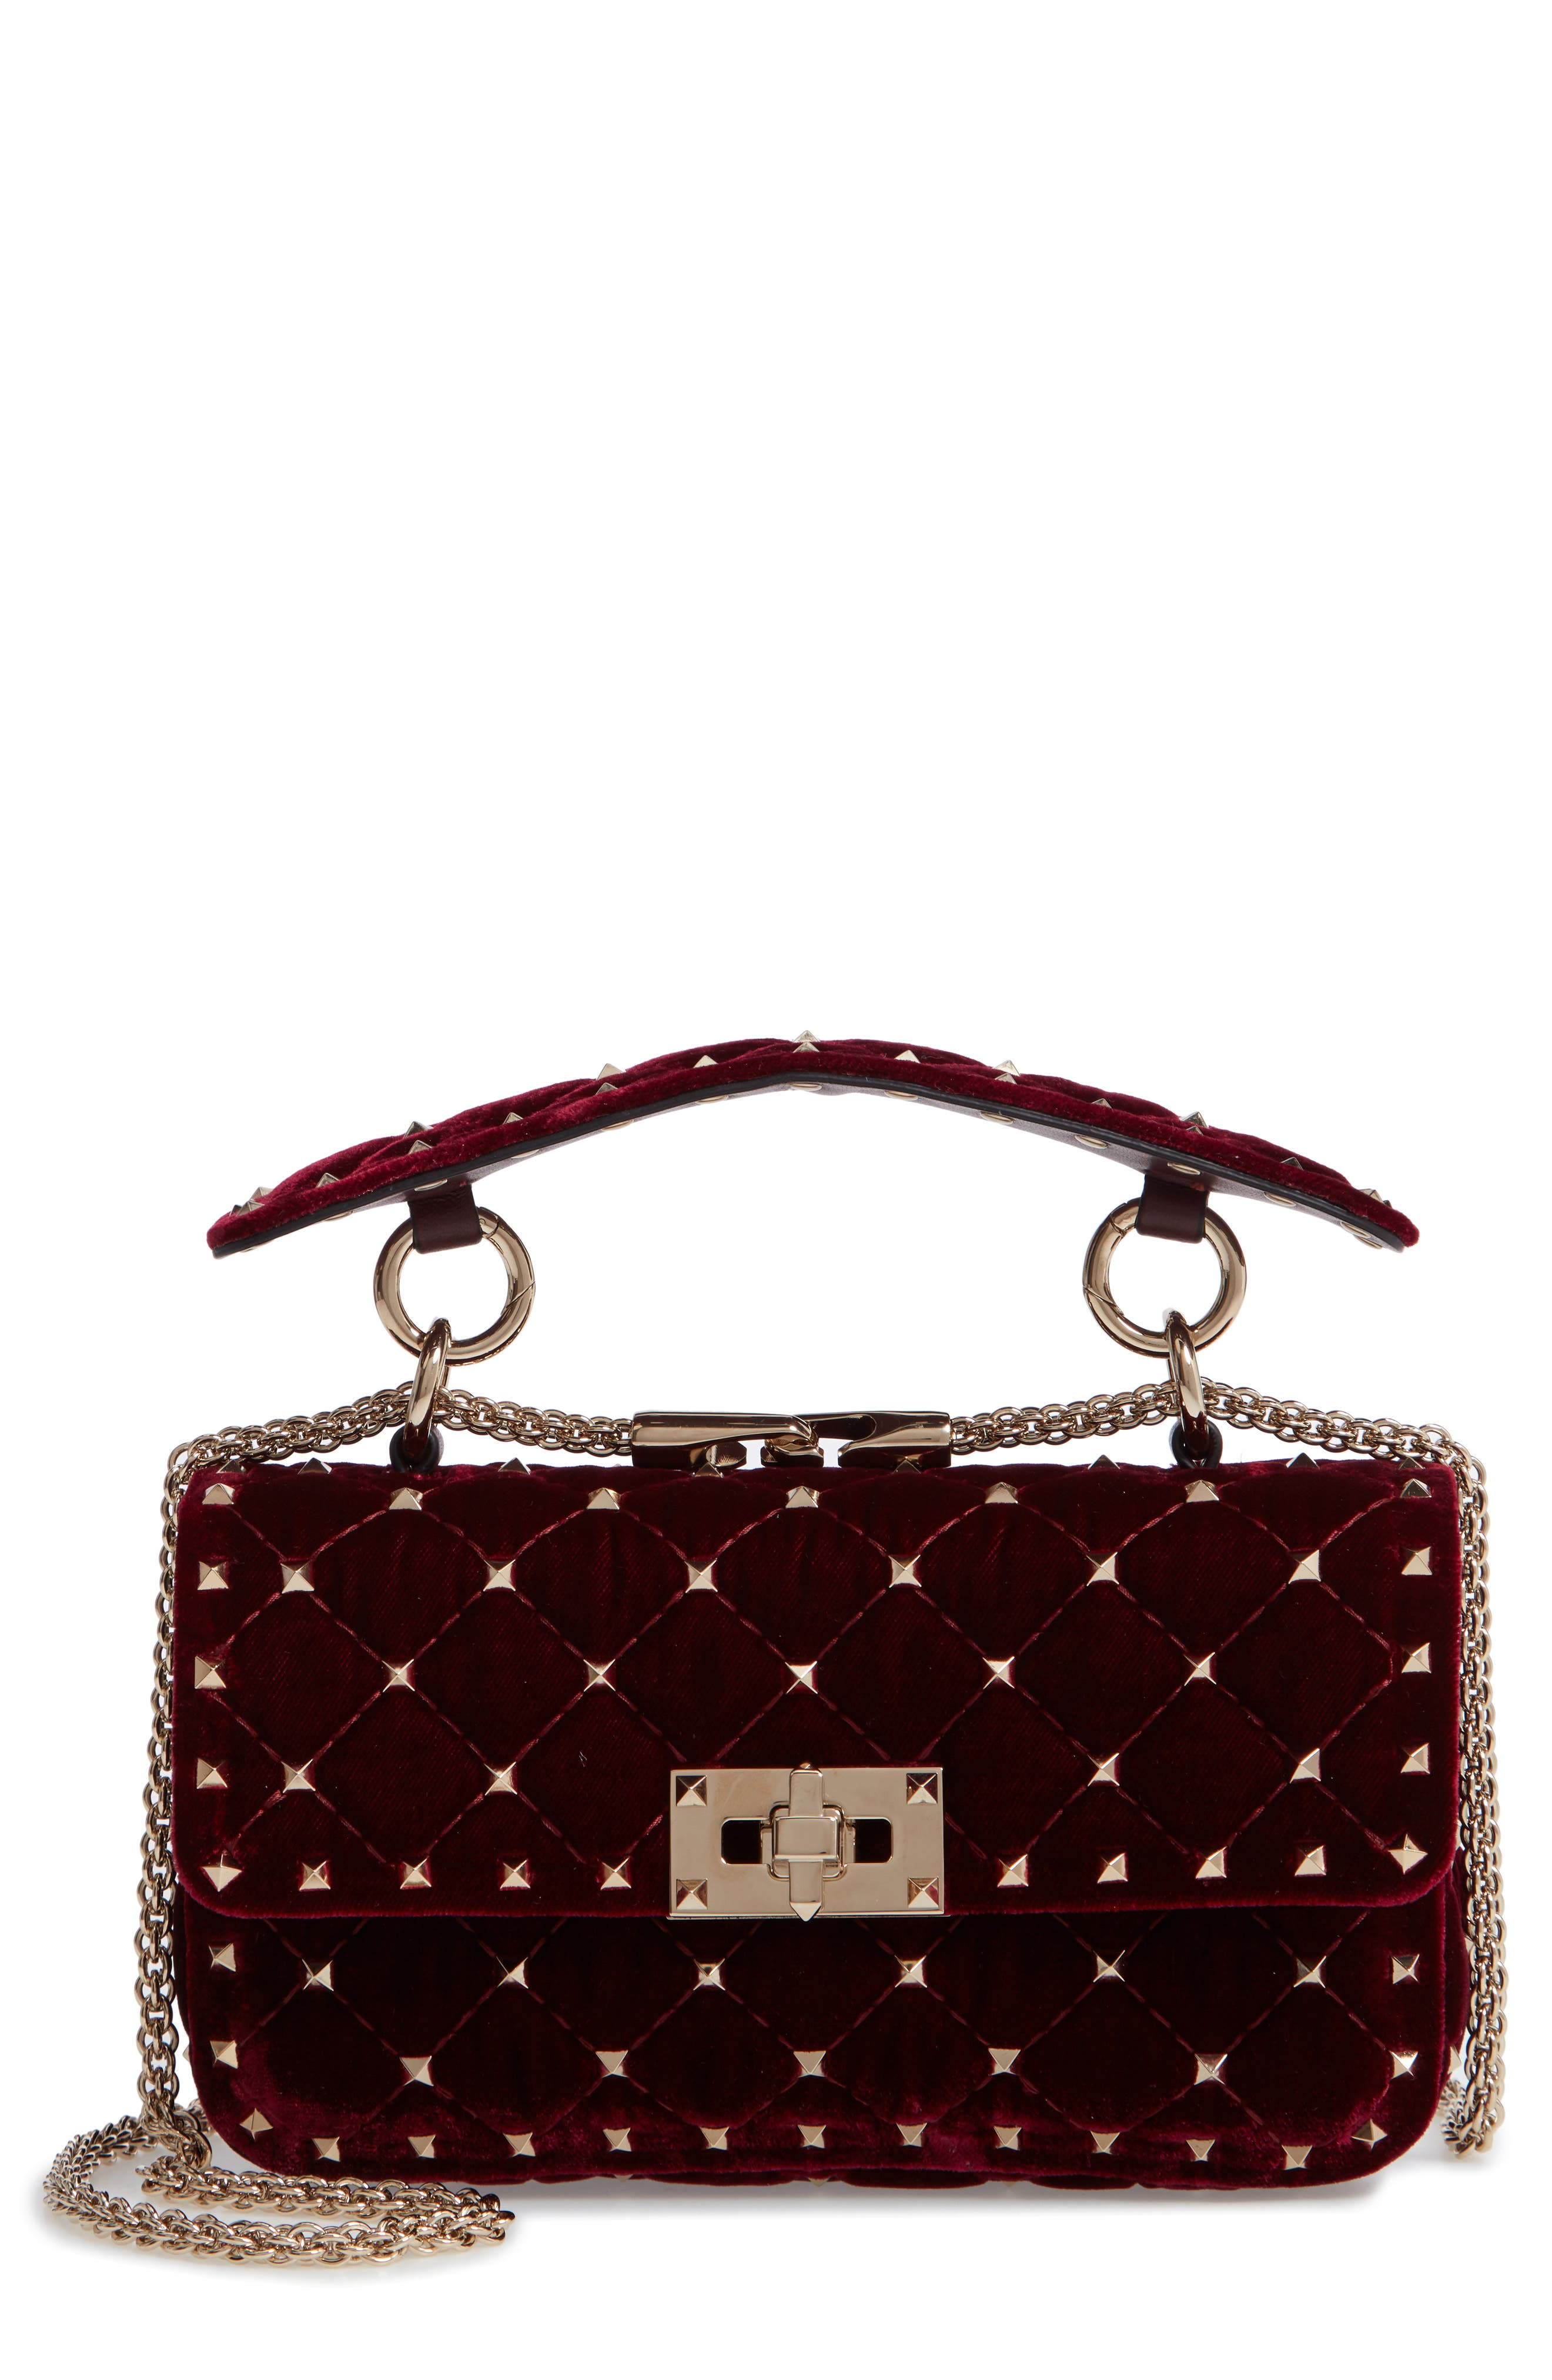 Rockstud Matelassé Velvet Small Shoulder Bag,                             Main thumbnail 1, color,                             RUBINO